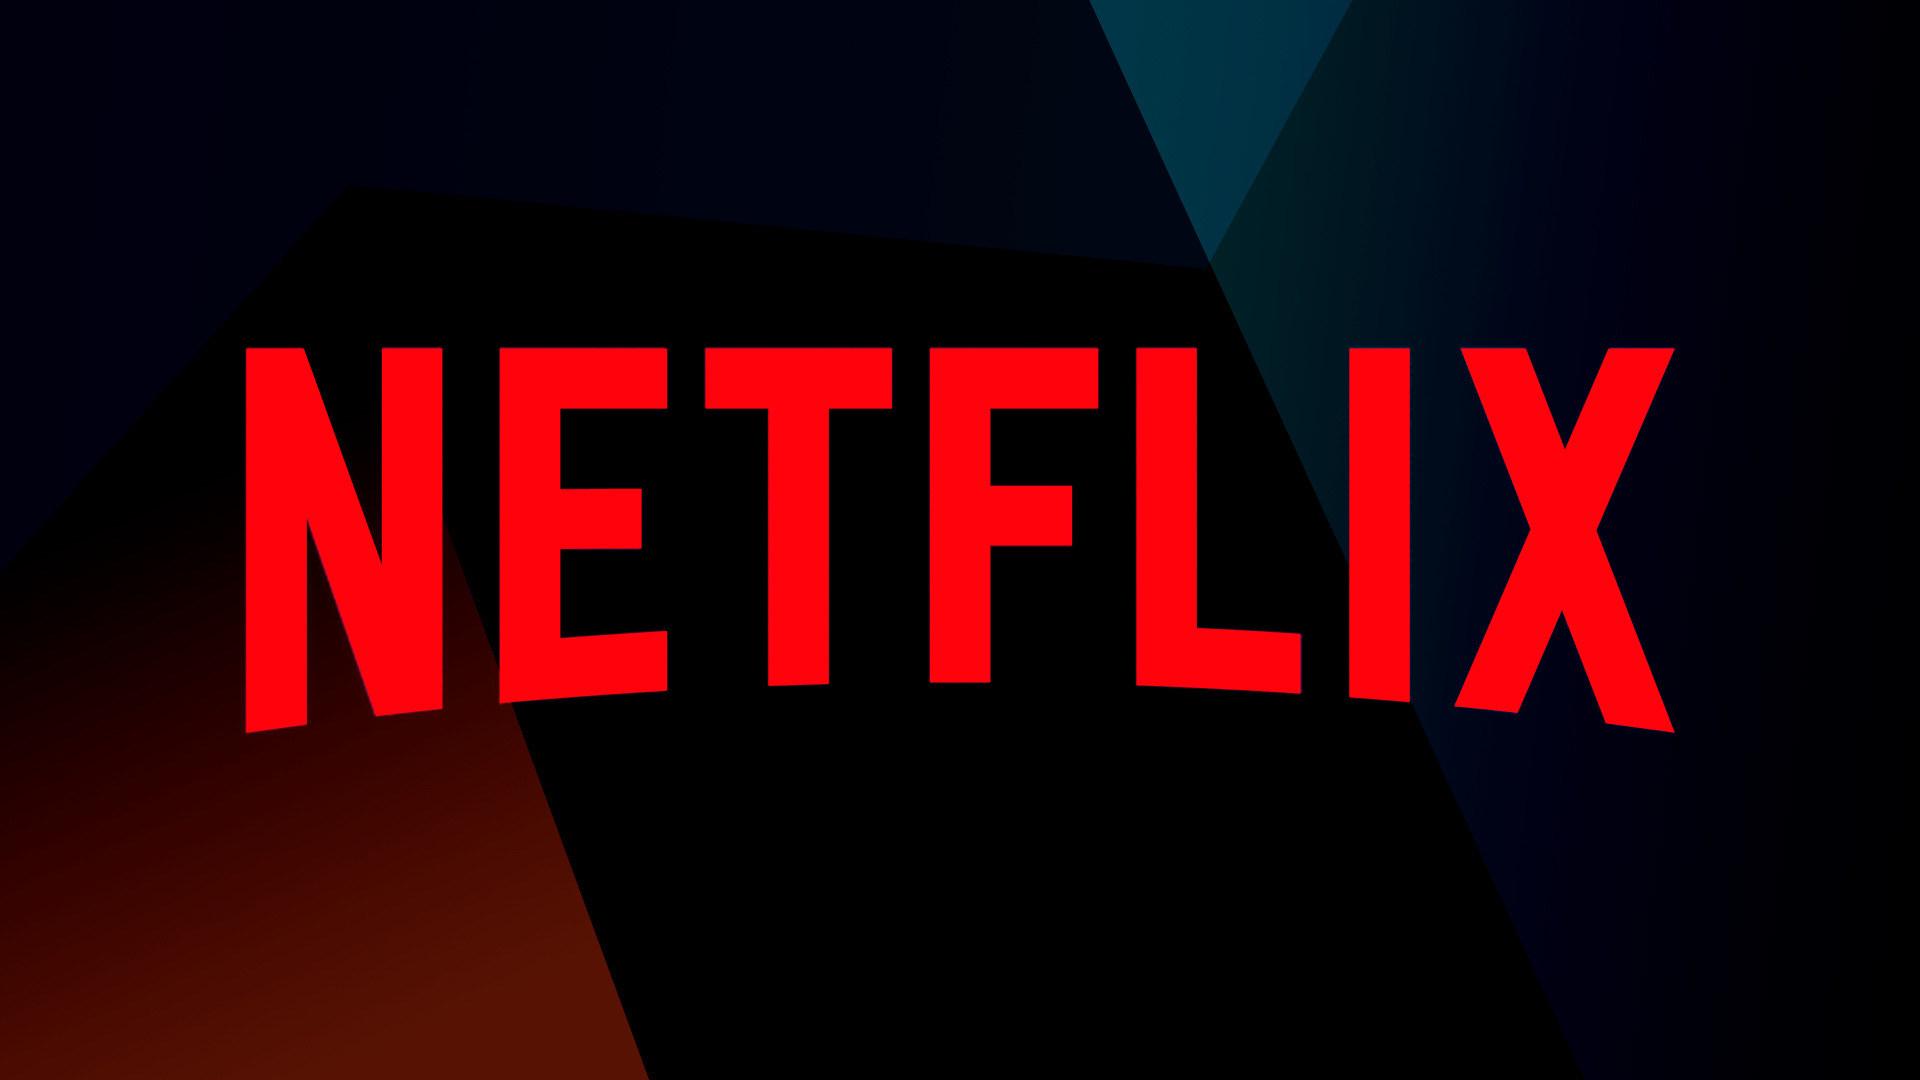 Streaming, Video, Logo, Tv, Fernsehen, Stream, Netflix, Videoplattform, Serie, Filme, Streamingportal, Serien, Videostreaming, Netflix Deutschland, Binge Watching, Netflix Logo, Netflix Originals